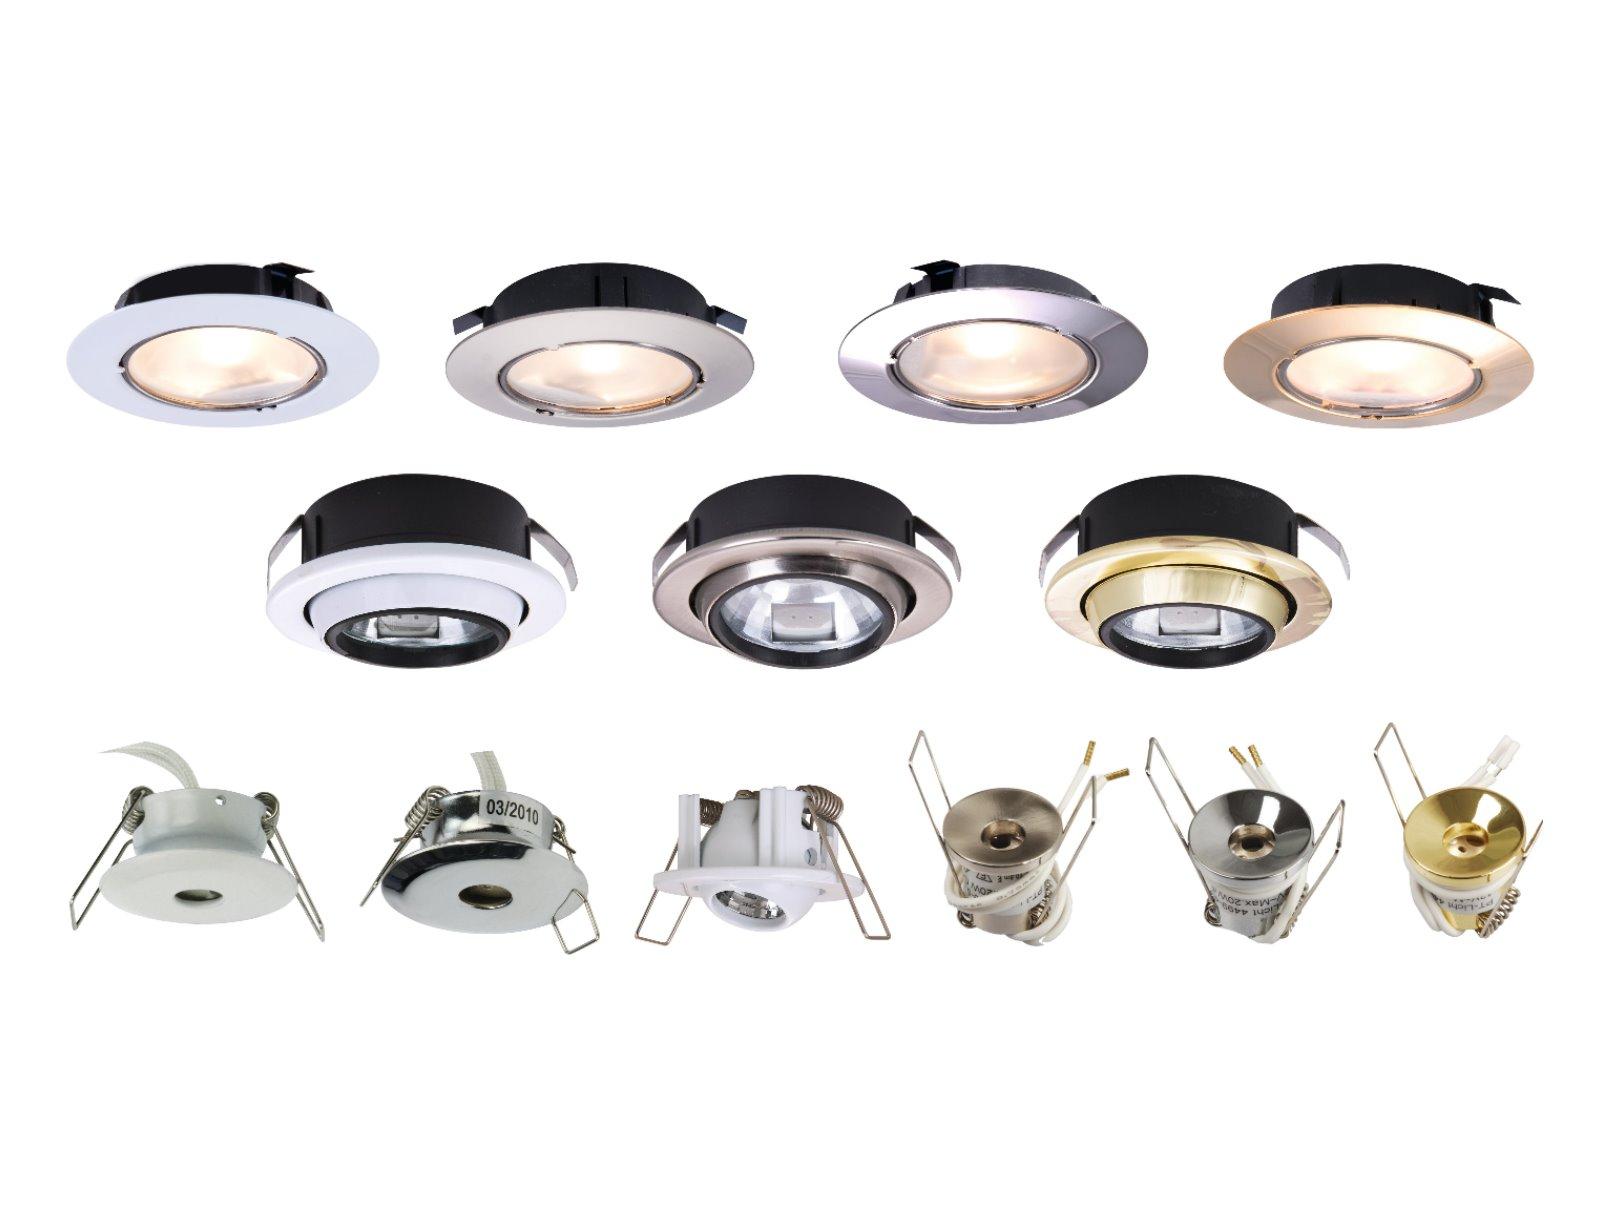 licht-led-rahmen-g4-ebay Fabelhafte Led Lampen G4 Fassung Dekorationen